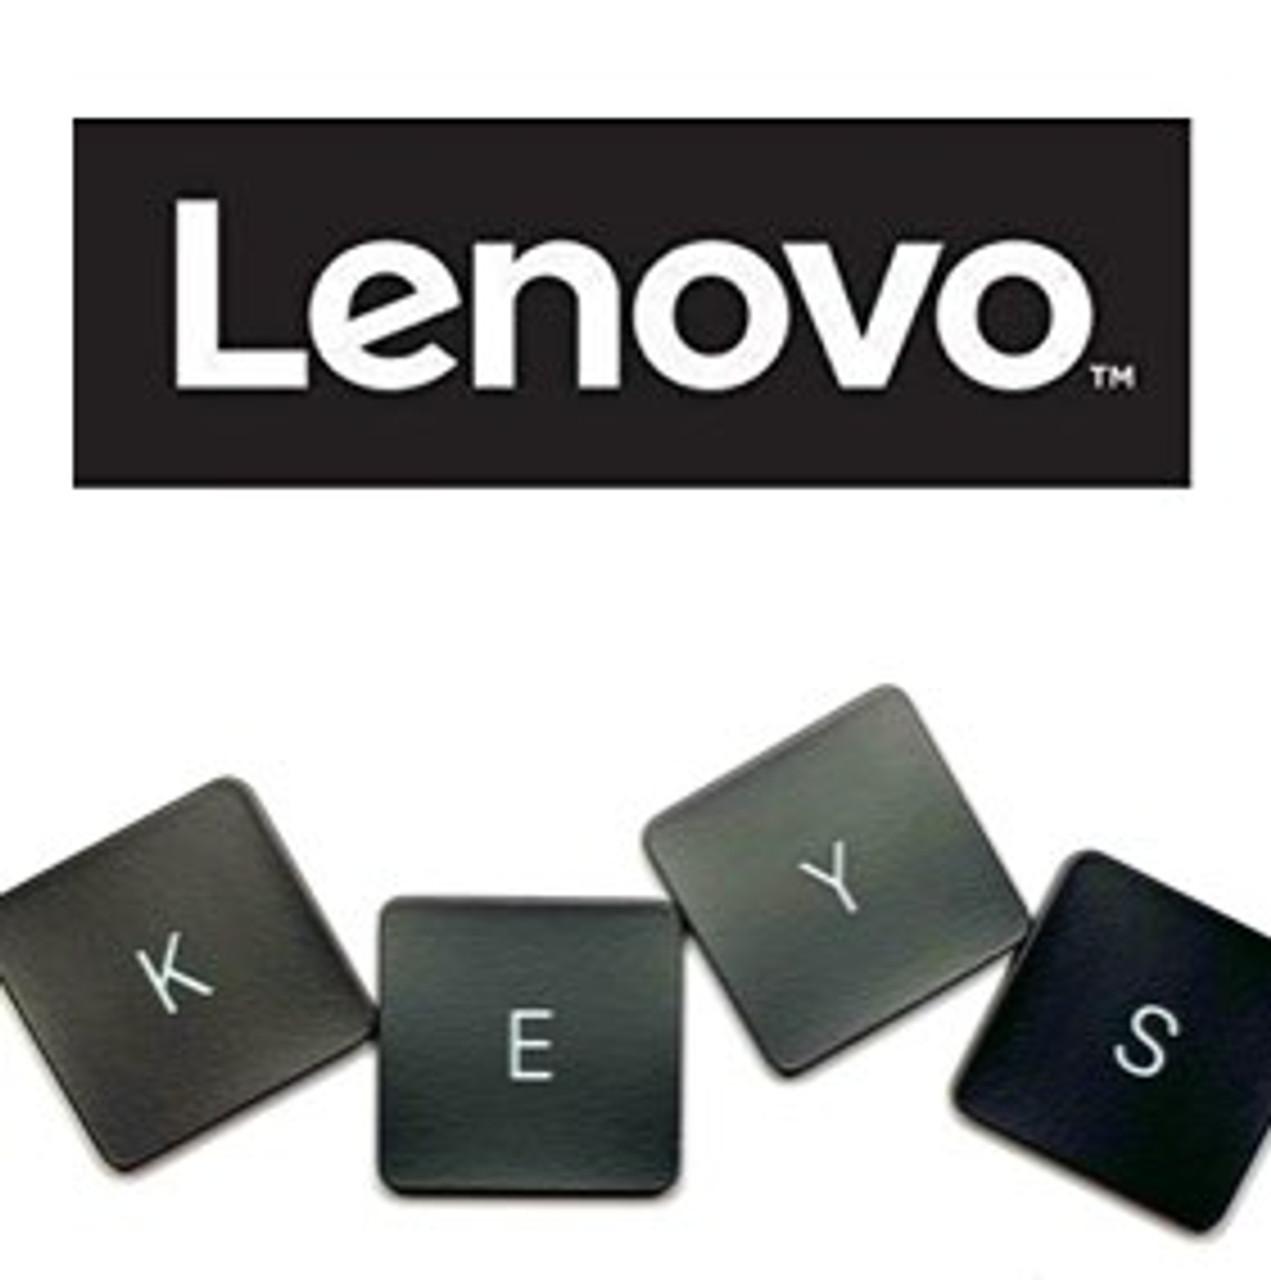 Lenovo ThinkPad T430 Keyboard Key Replacement (Backlit)